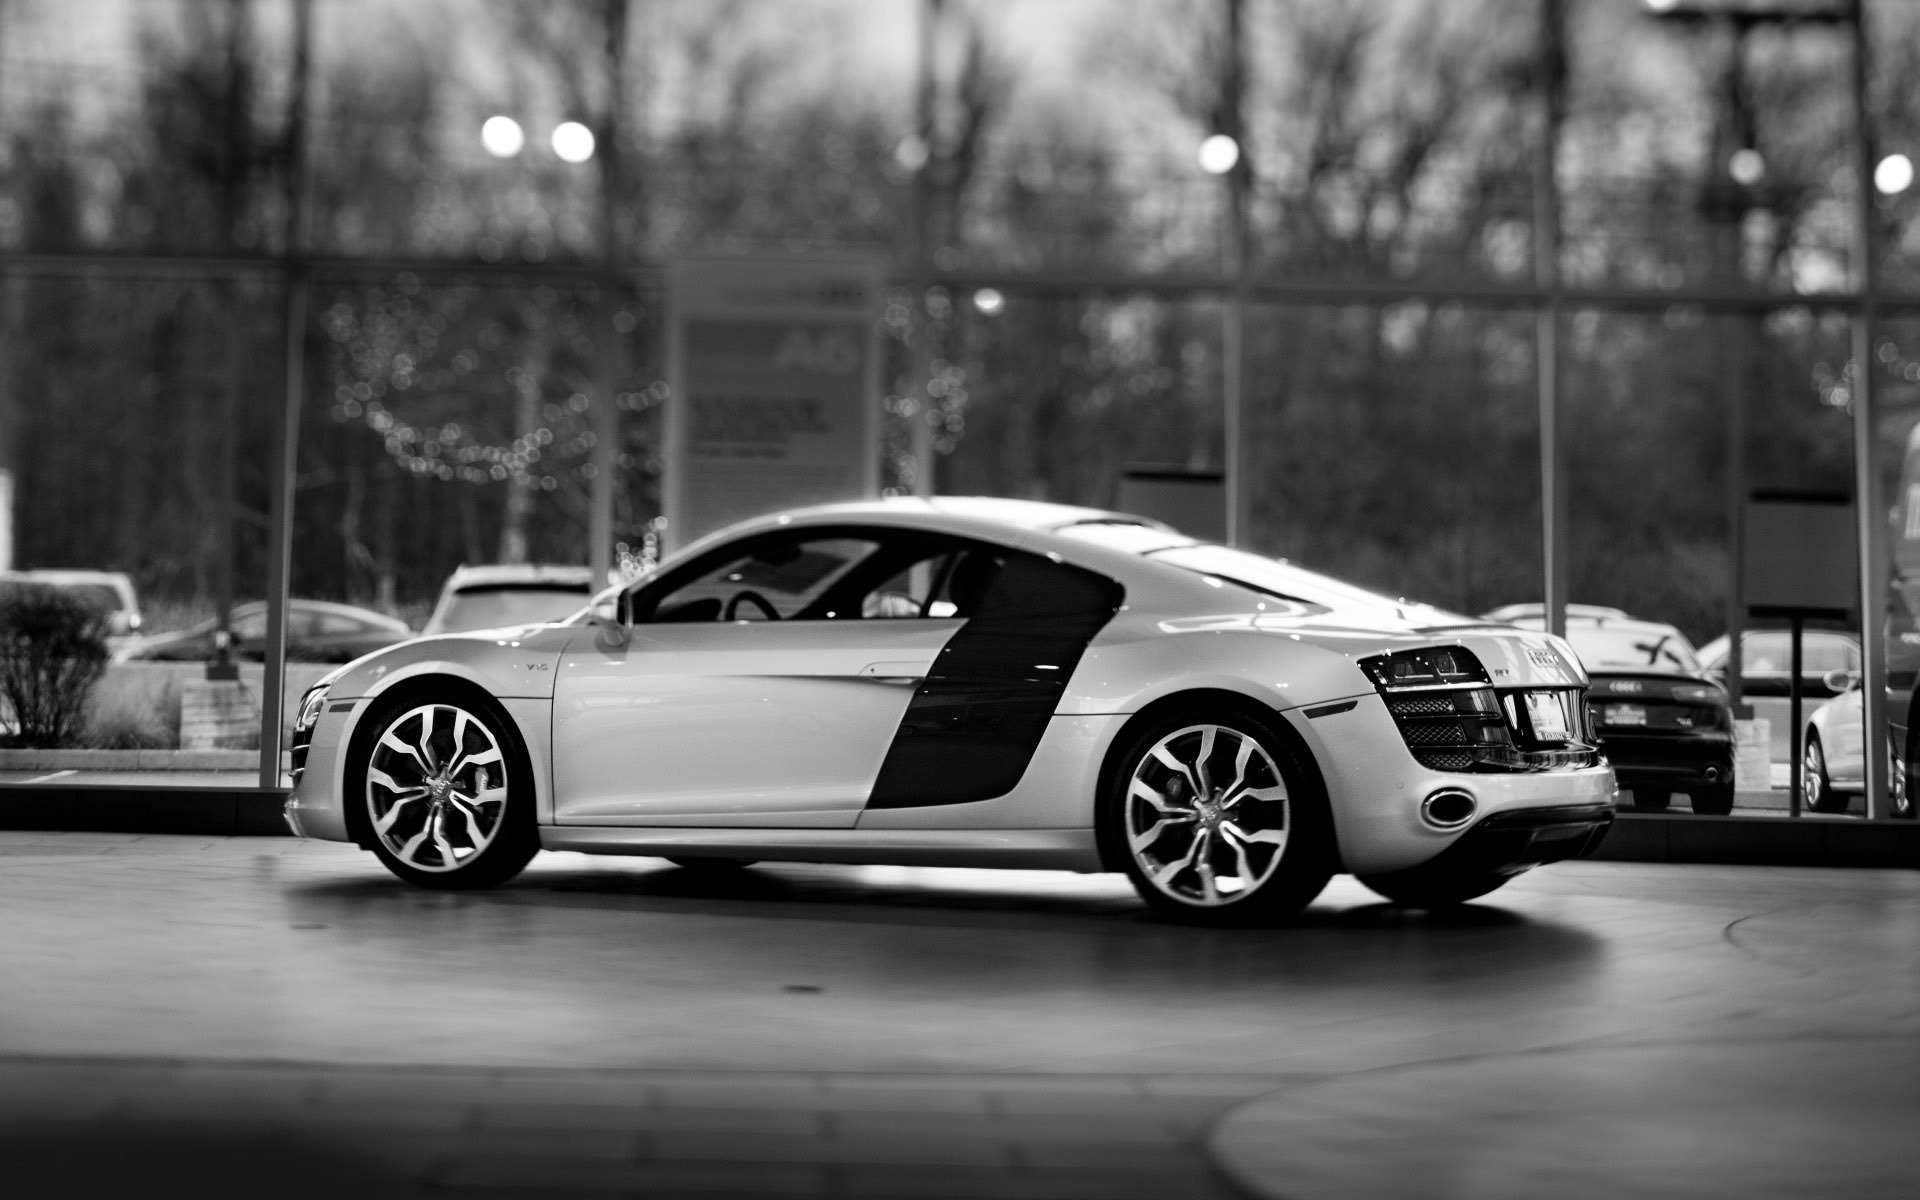 Audi R8 V10 wallpaper 1920x1200